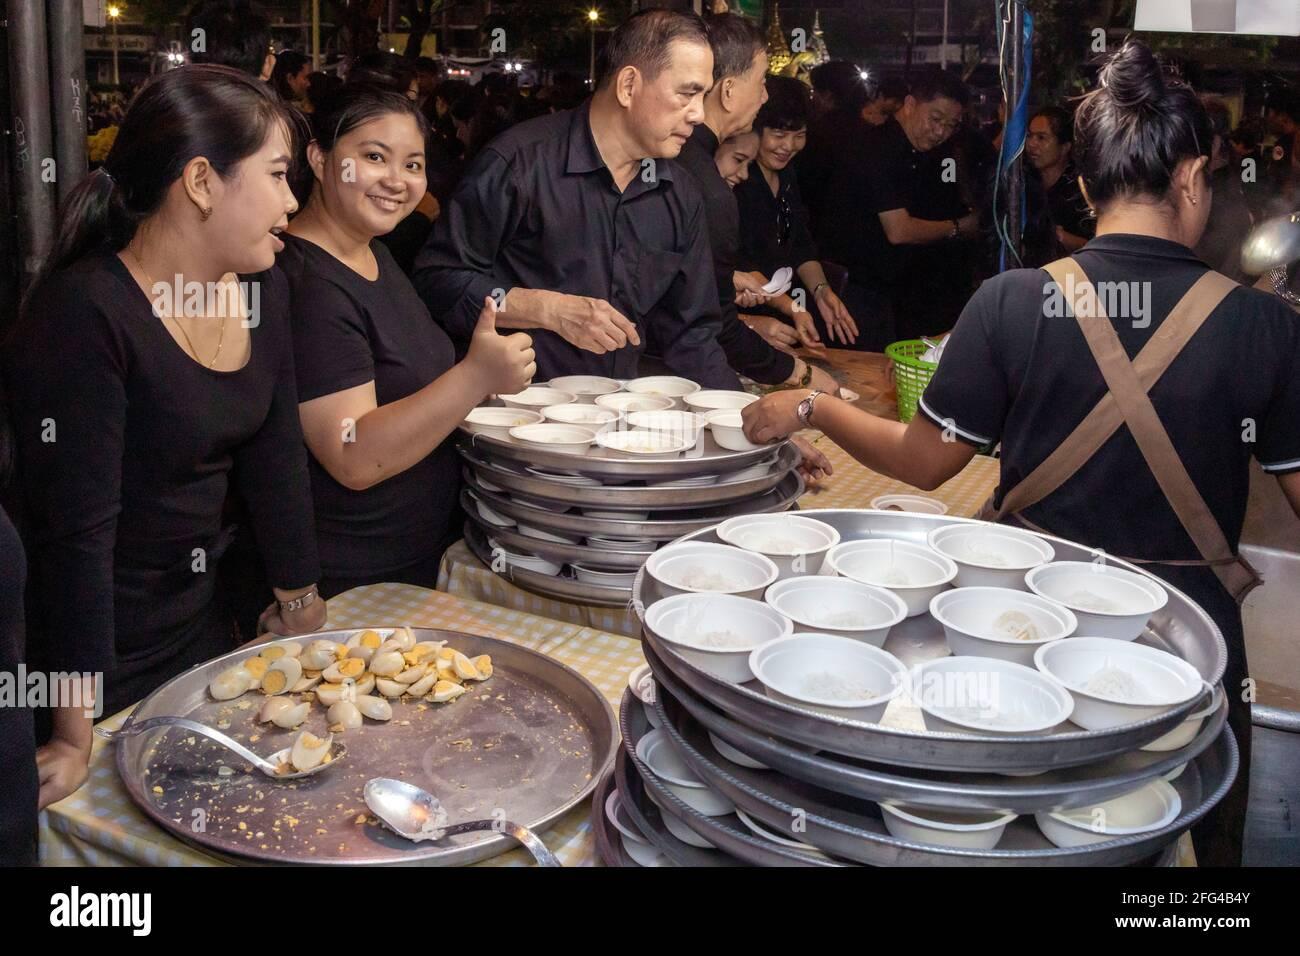 Funeral mourners getting food, King Bhumipol, Rama IX, Bangkok, Thailand Stock Photo